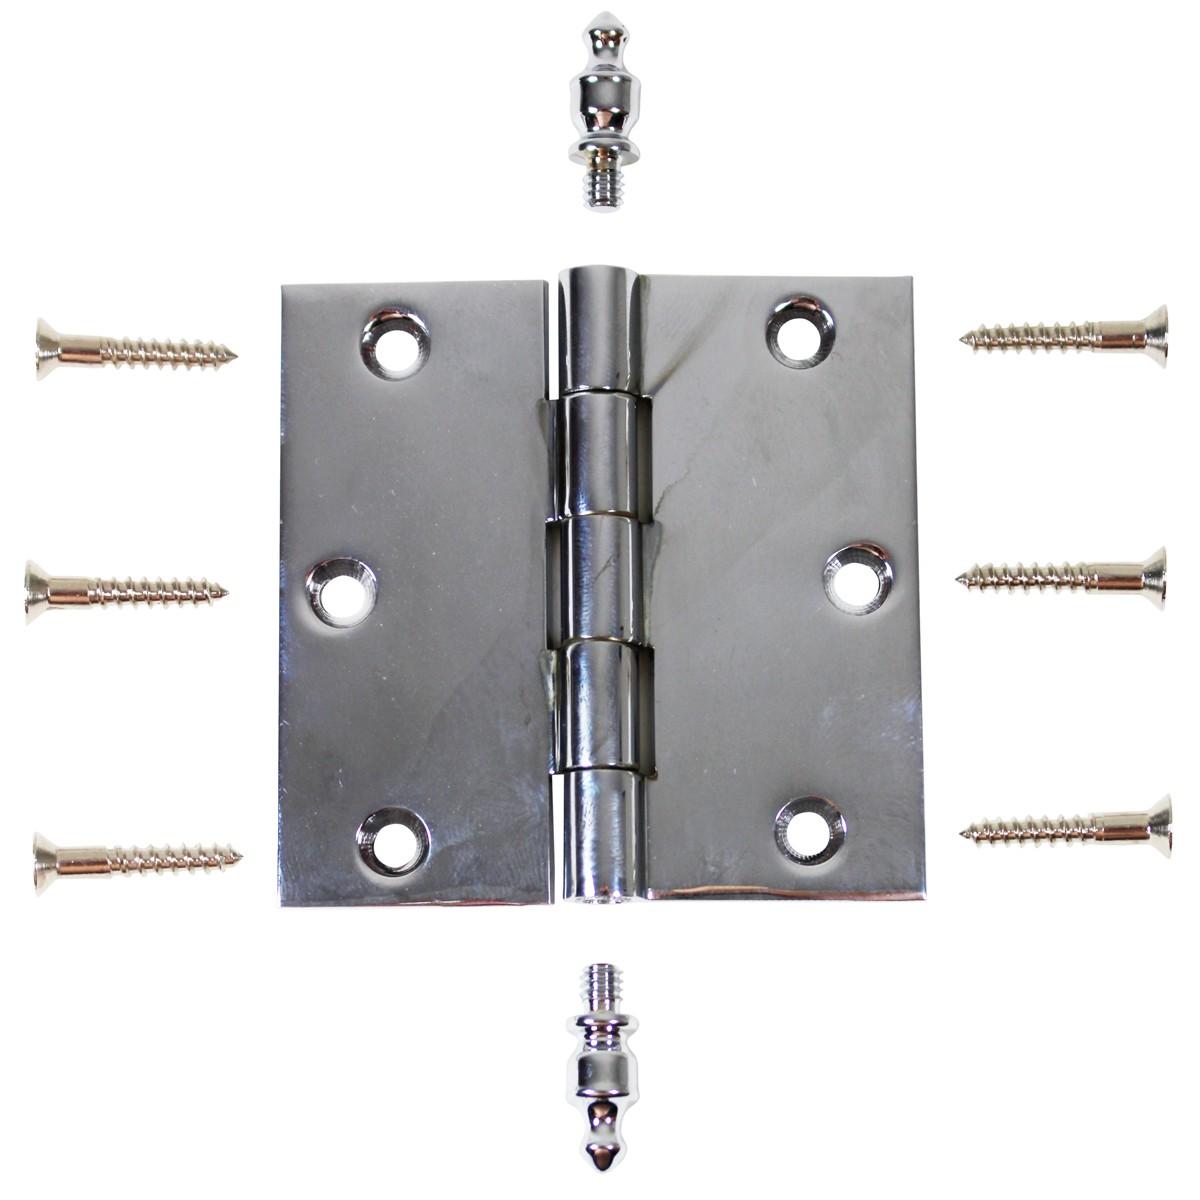 Chrome Solid Brass Cabinet Hinge Urn Tip 3 Door Hinges Door Hinge Solid Brass Hinge